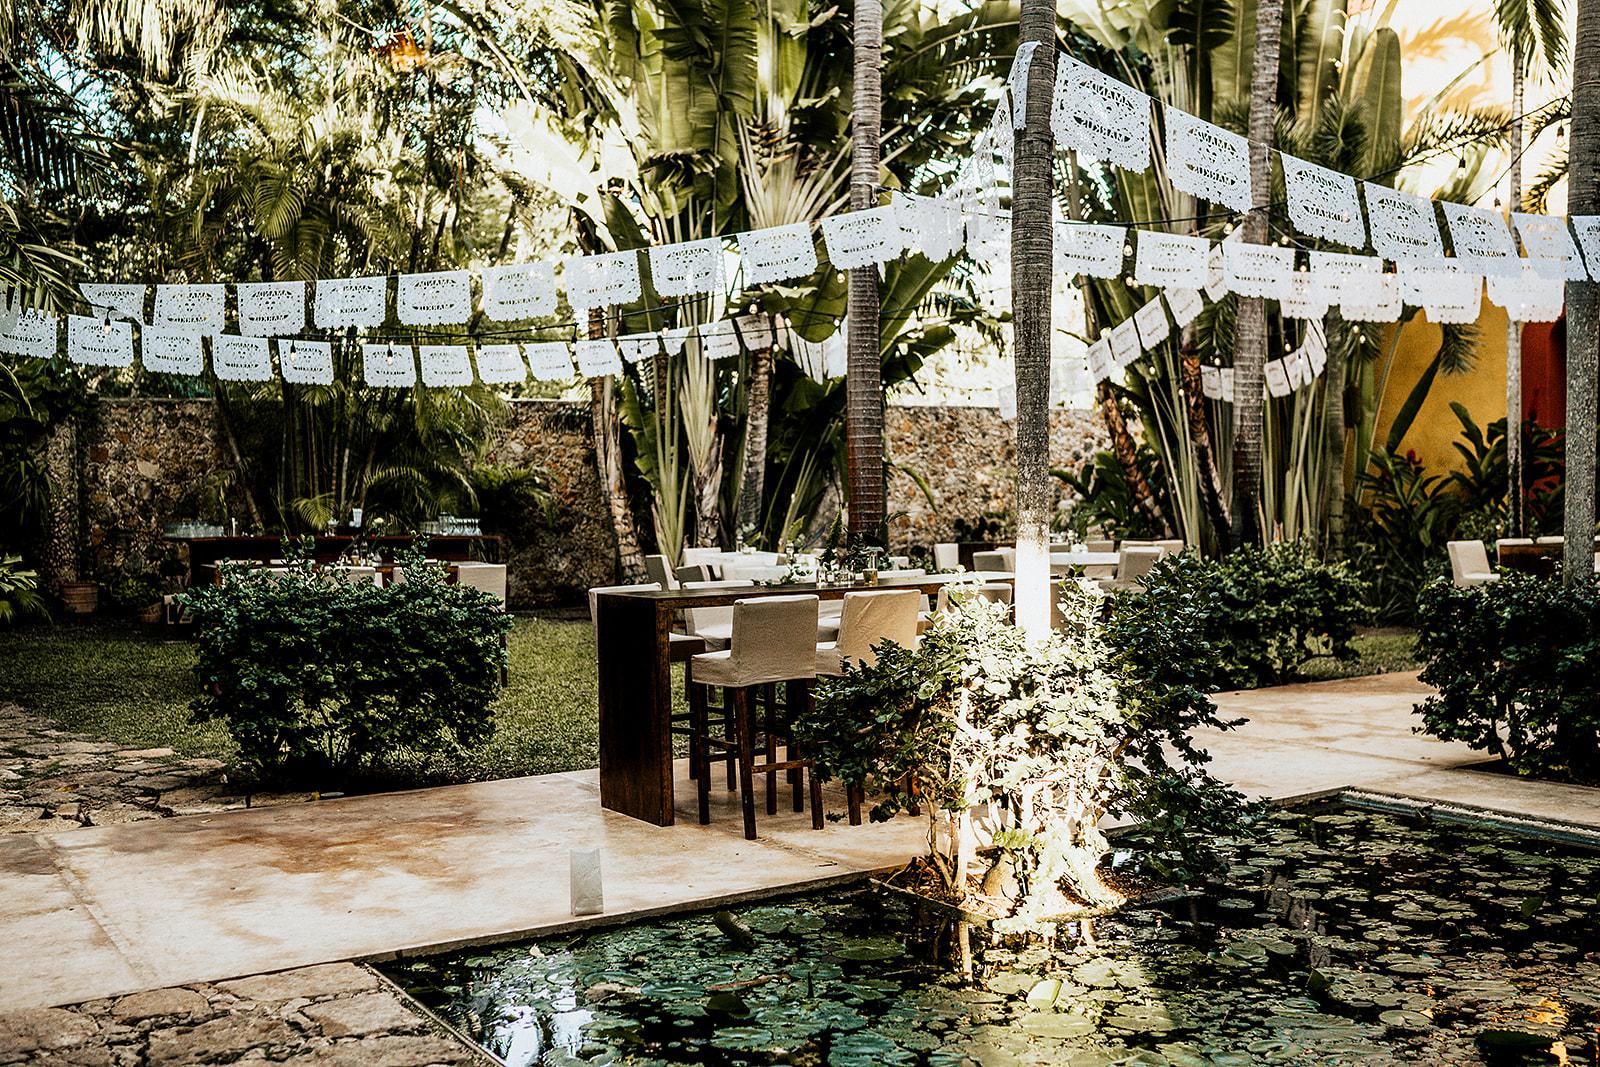 AmandaMarkus-Hacienda-Sac-Chich-Merida-Wedding-398_websize.jpg